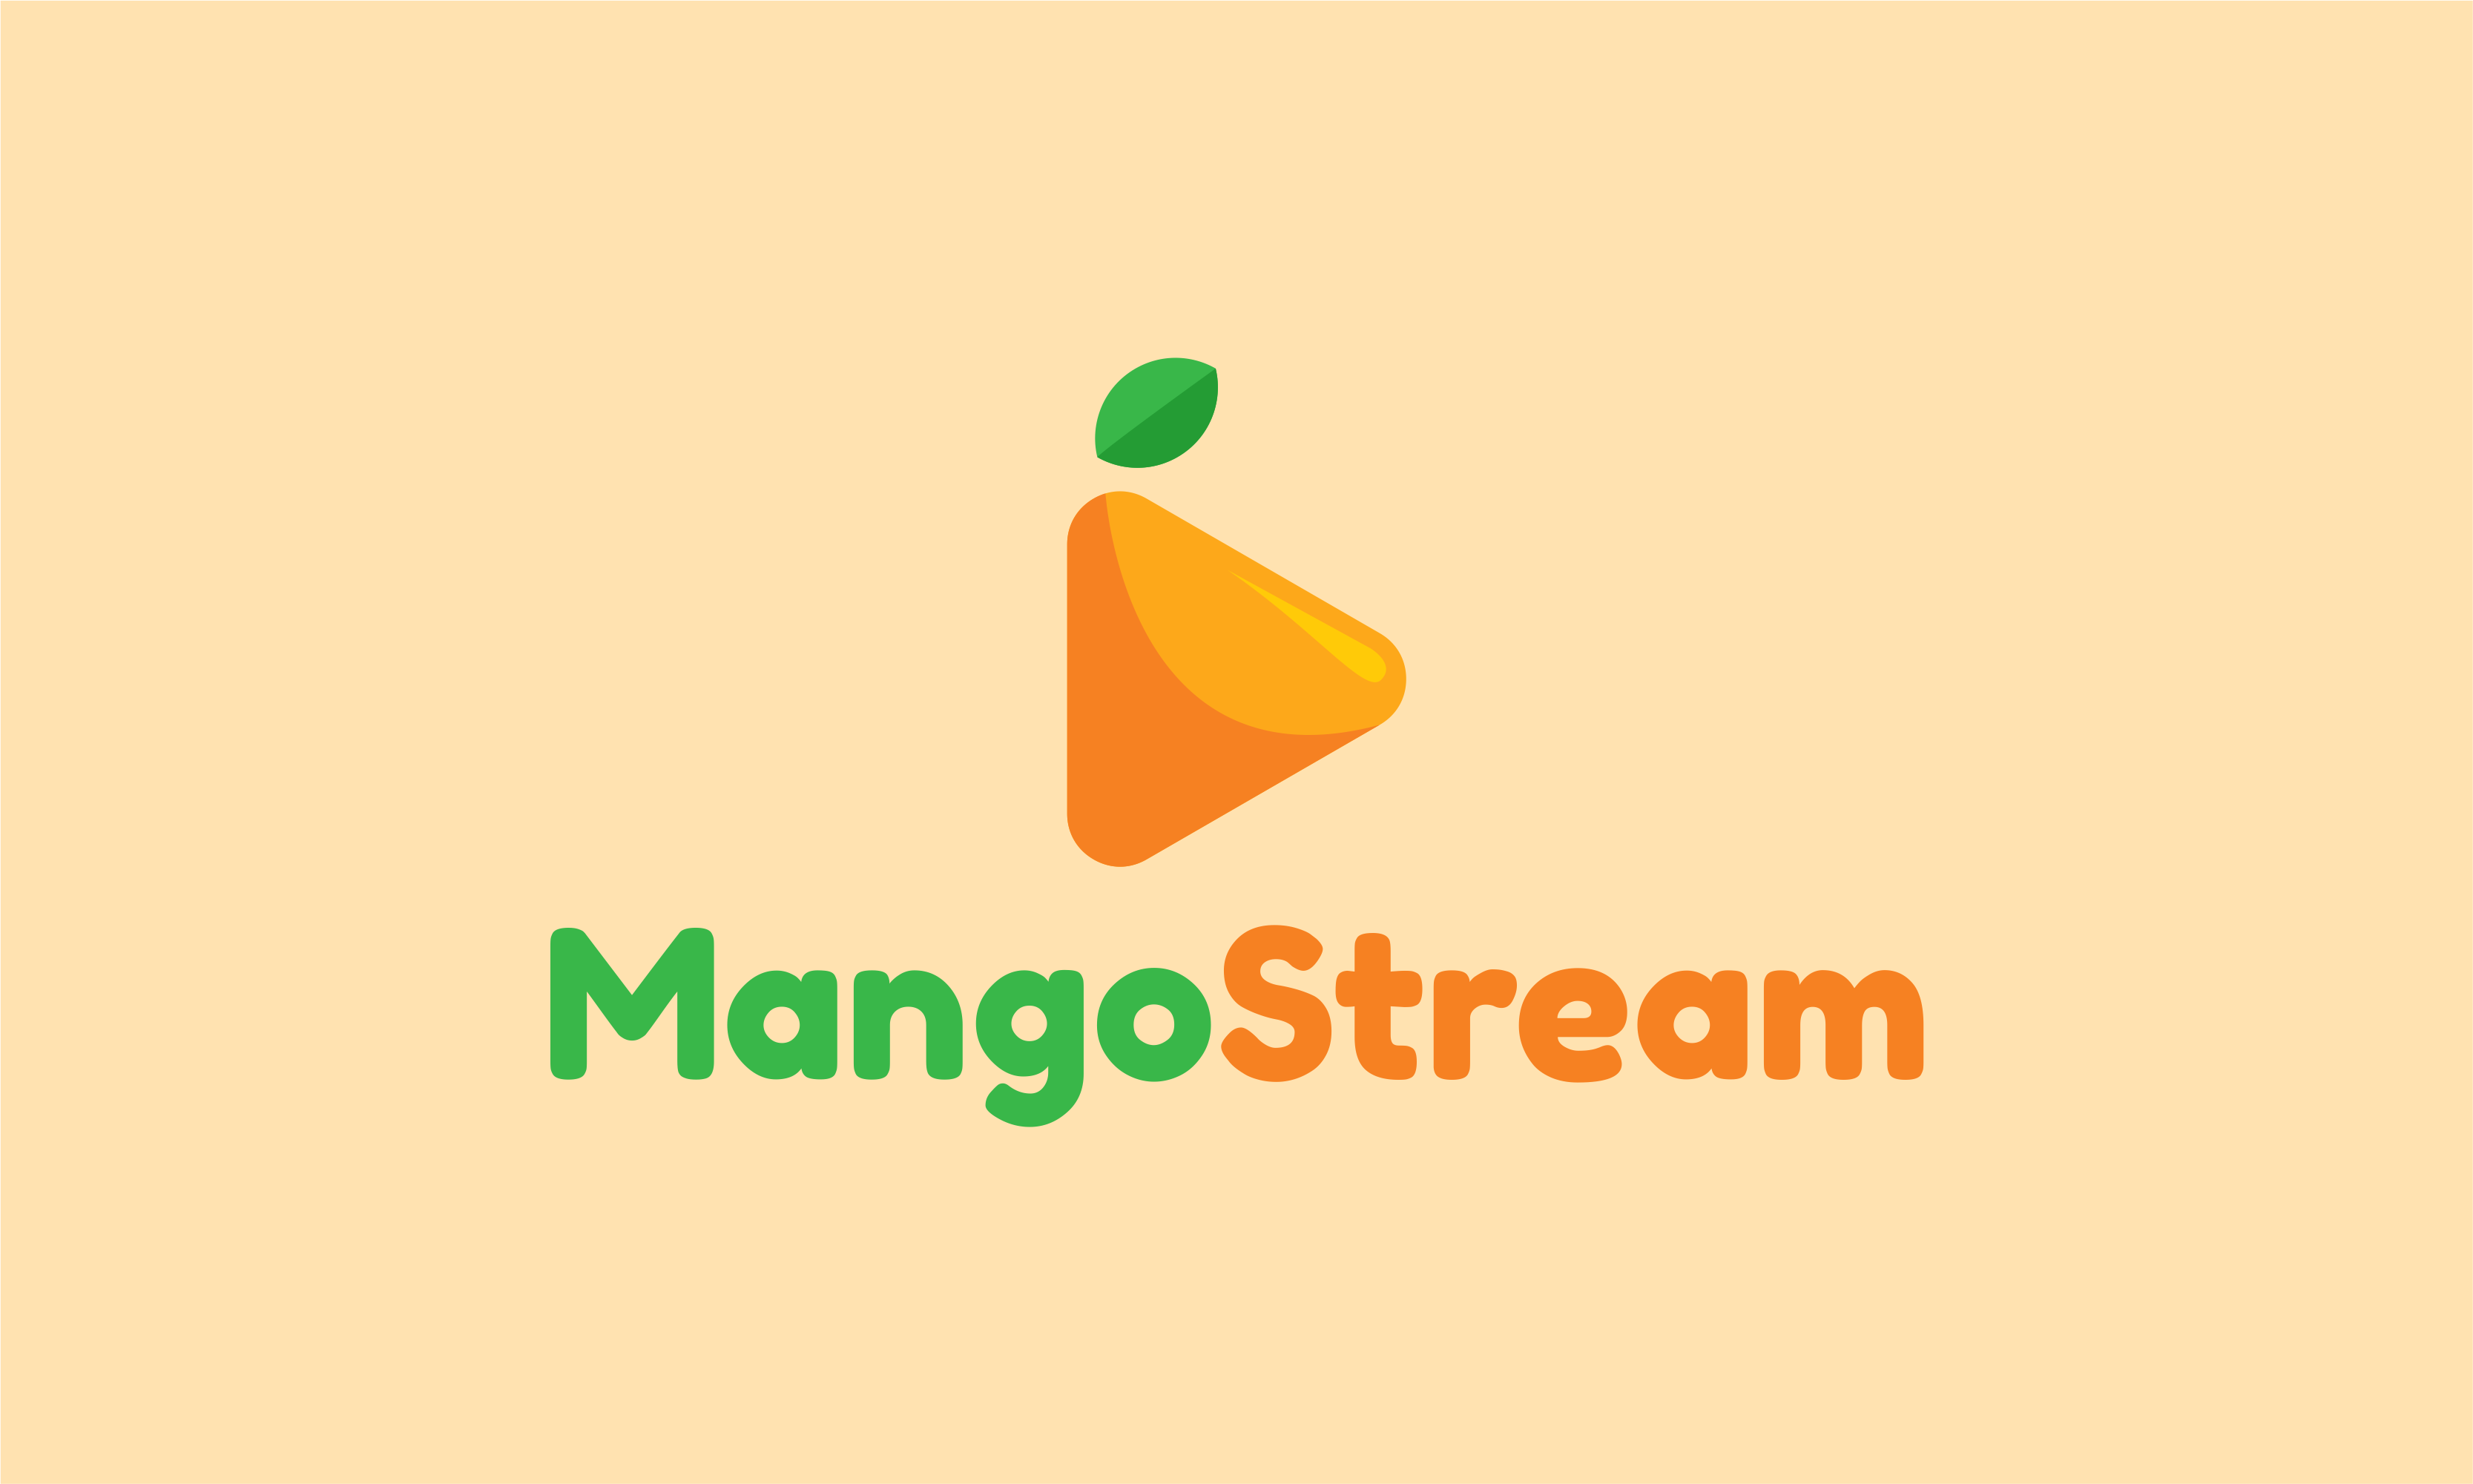 Mangostream